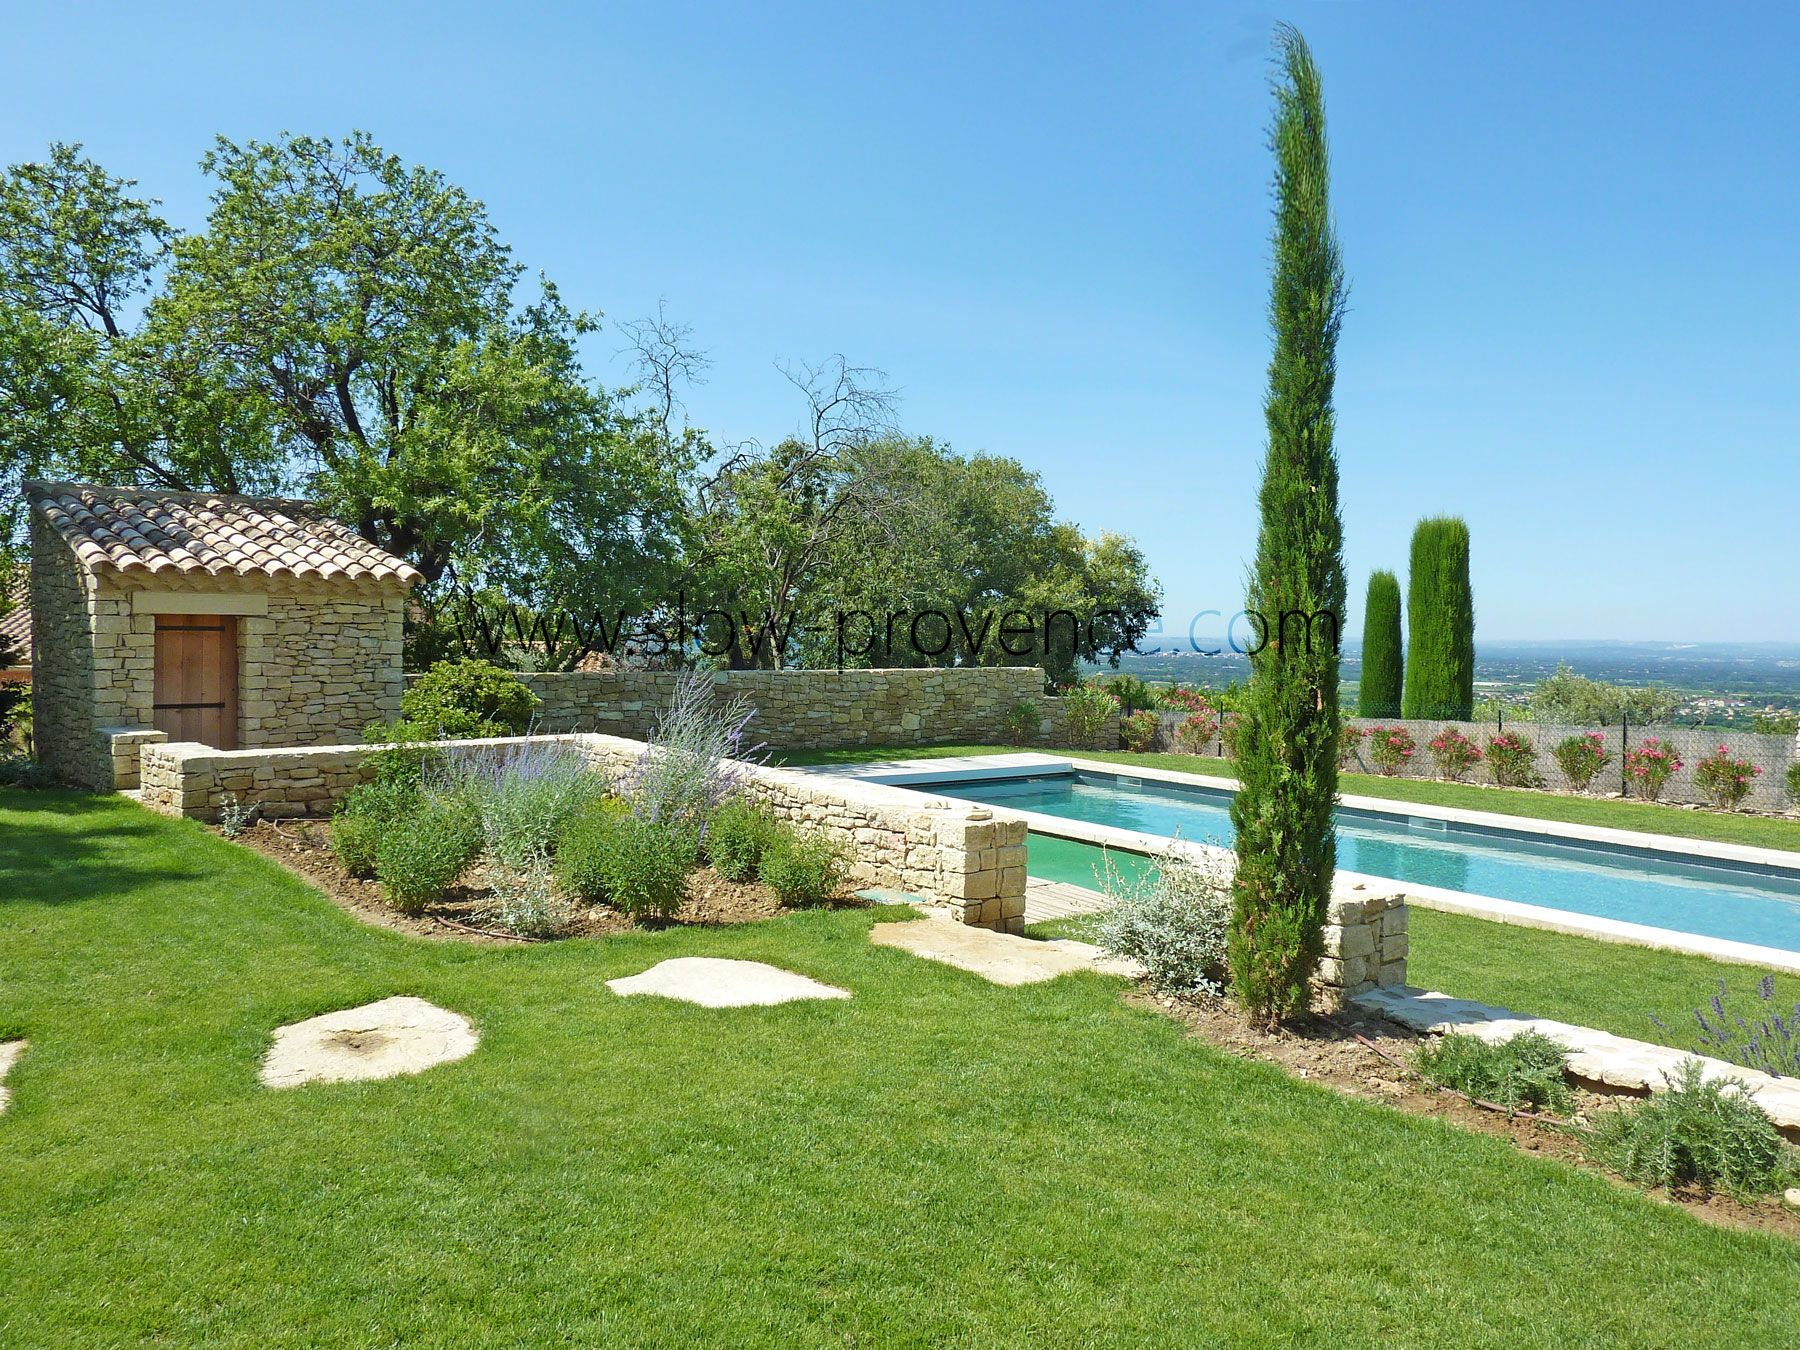 Villa ultra moderne  louer avec piscine chauffée privée jacuzzi